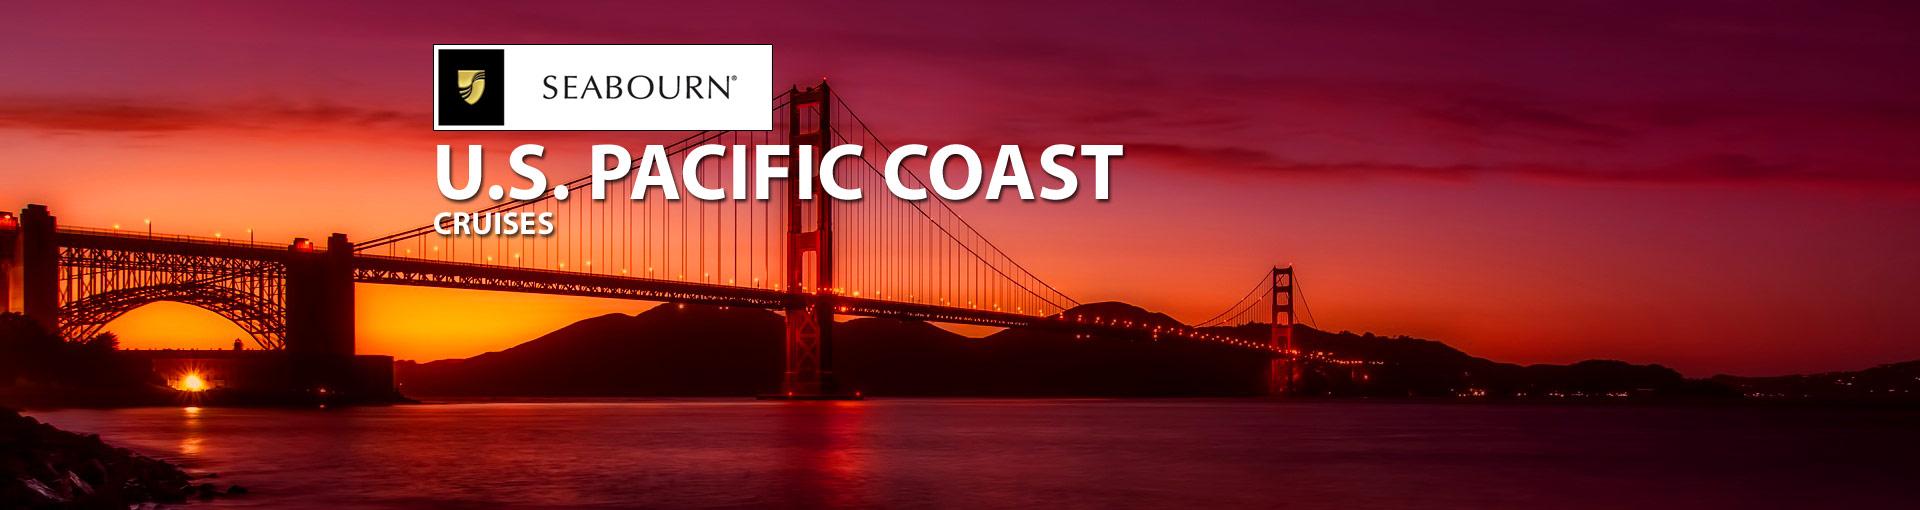 Seabourn US Pacific Coast Cruises